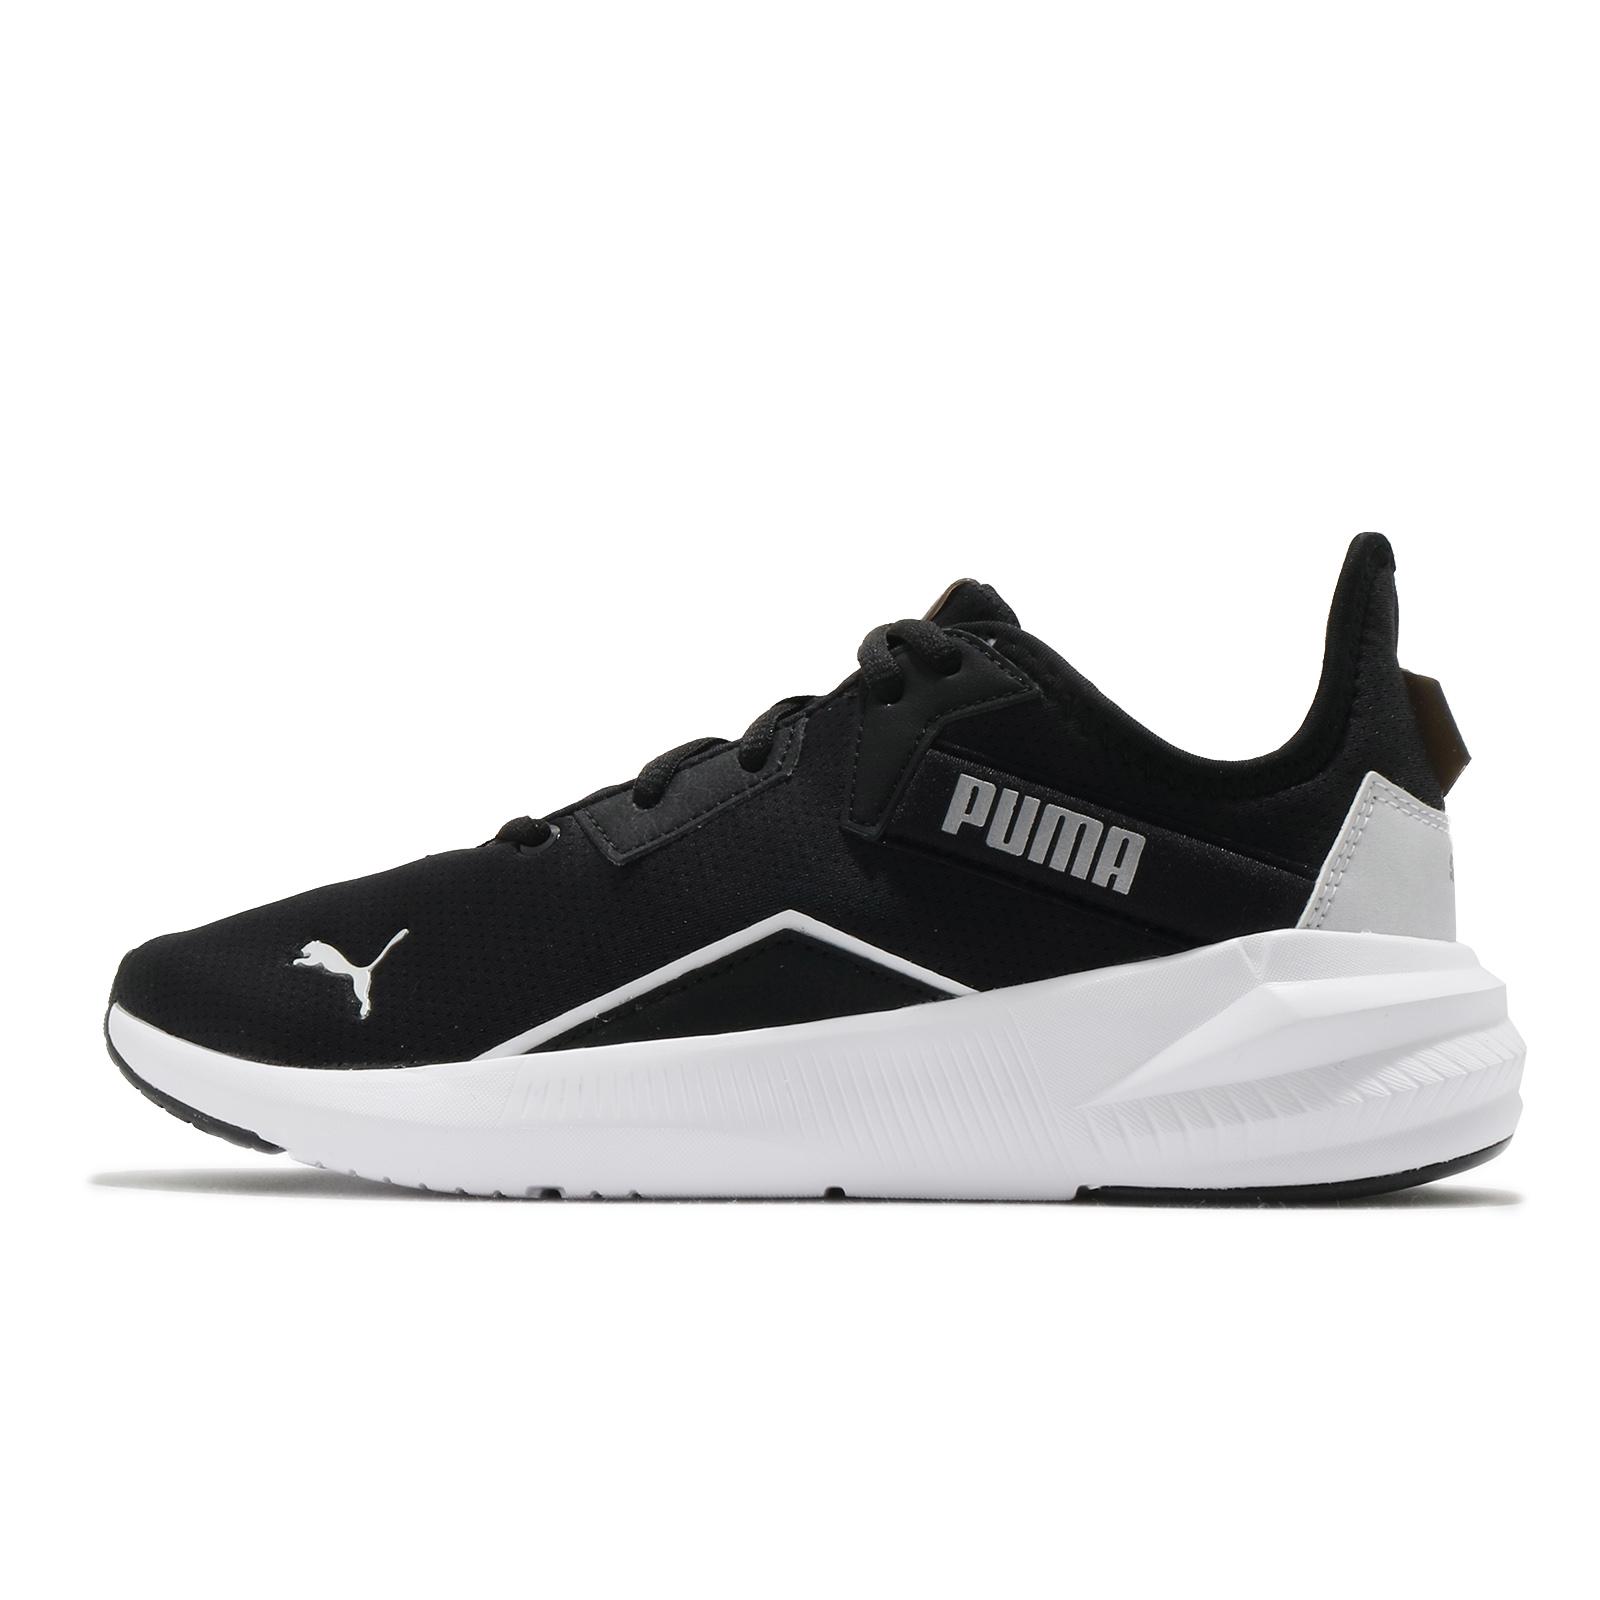 Puma 訓練鞋 Platinum Wns 黑 白 女鞋 多功能 運動鞋【ACS】 19375101